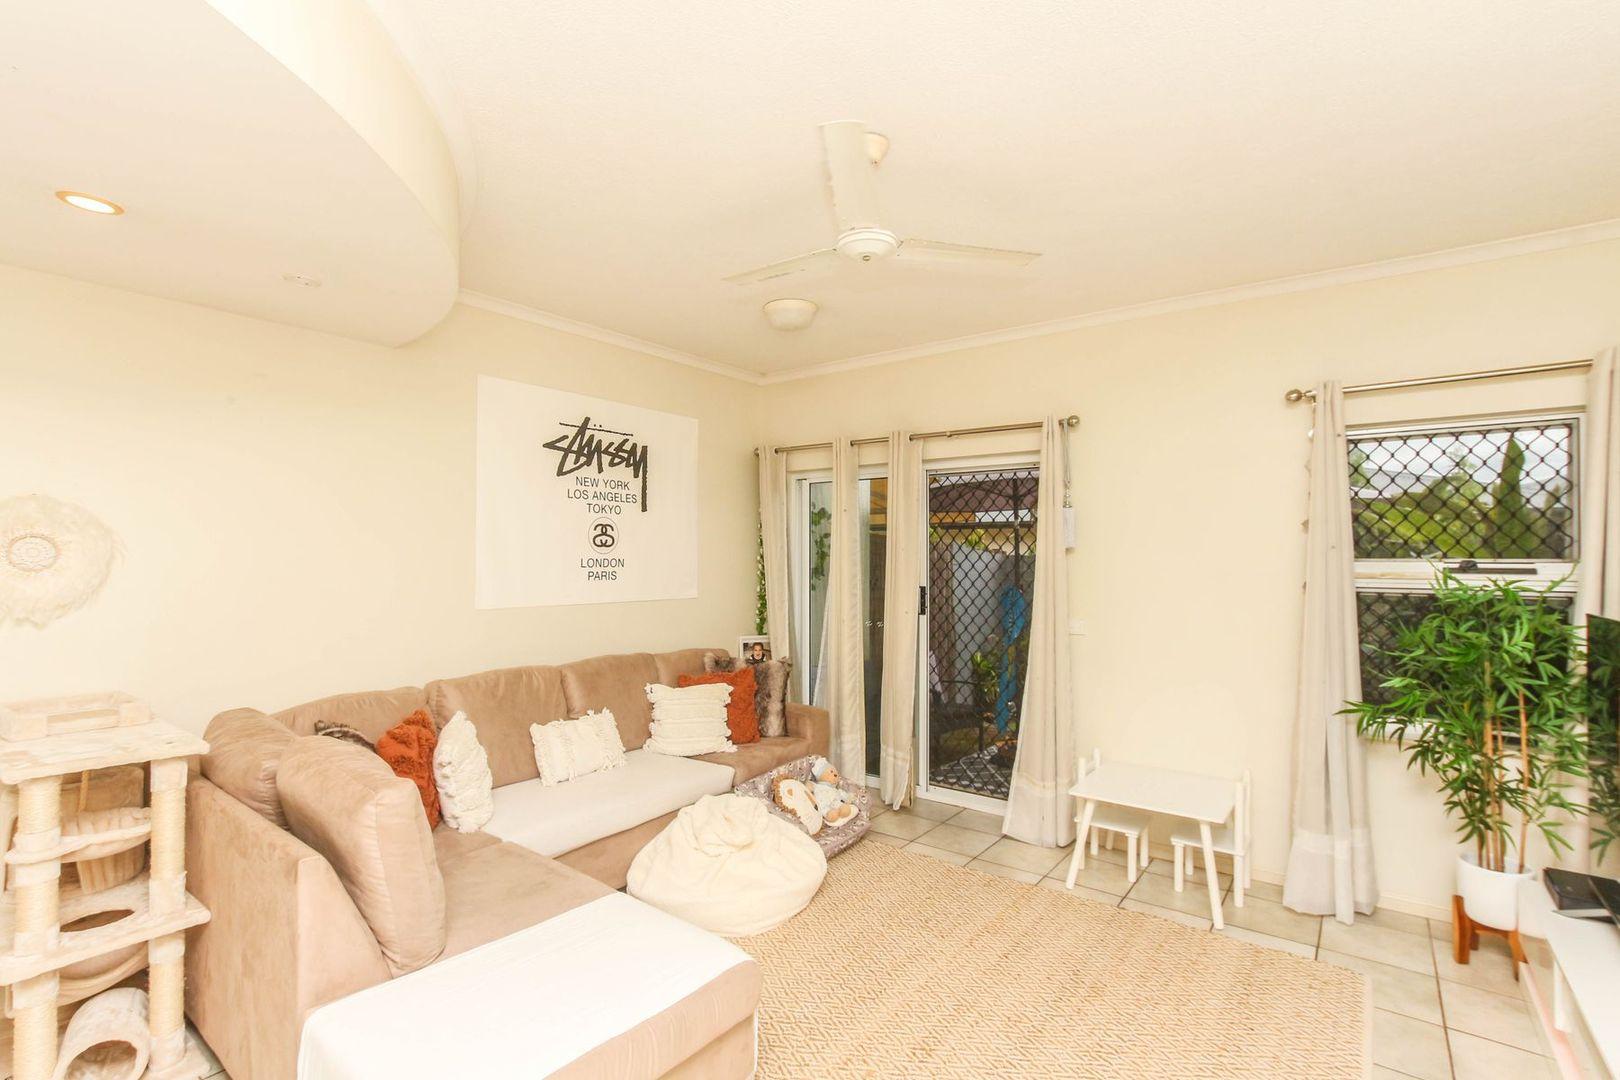 14/7A Grantala Street, Manoora QLD 4870, Image 1